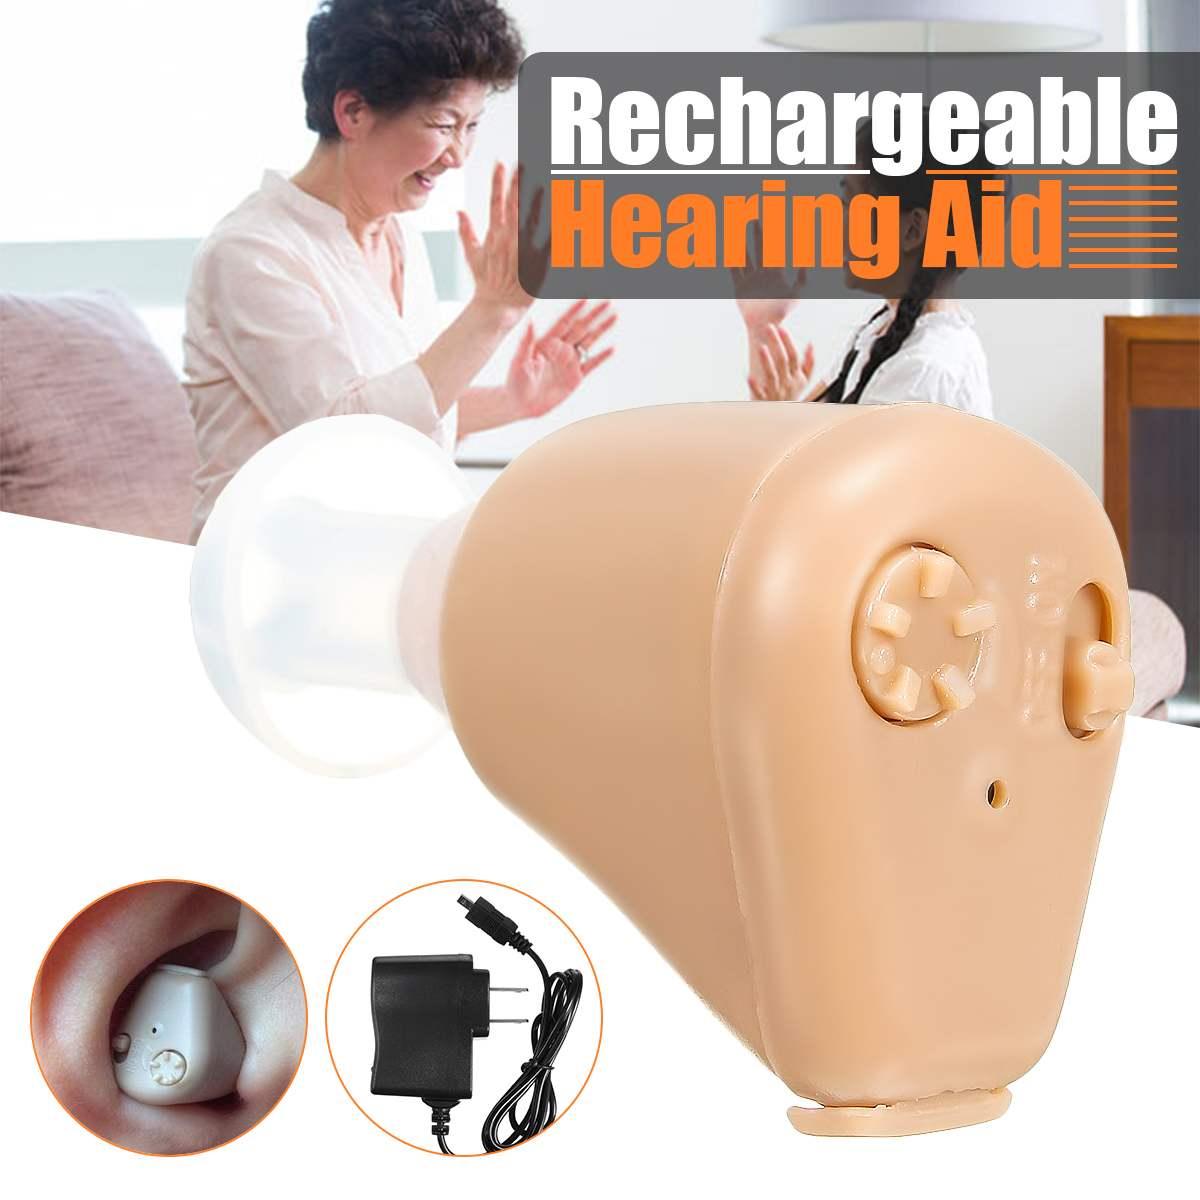 Mini audífono recargable de alta calidad amplificador de sonido de oído audífonos diminuto ayuda de voz recargable audífono Personal